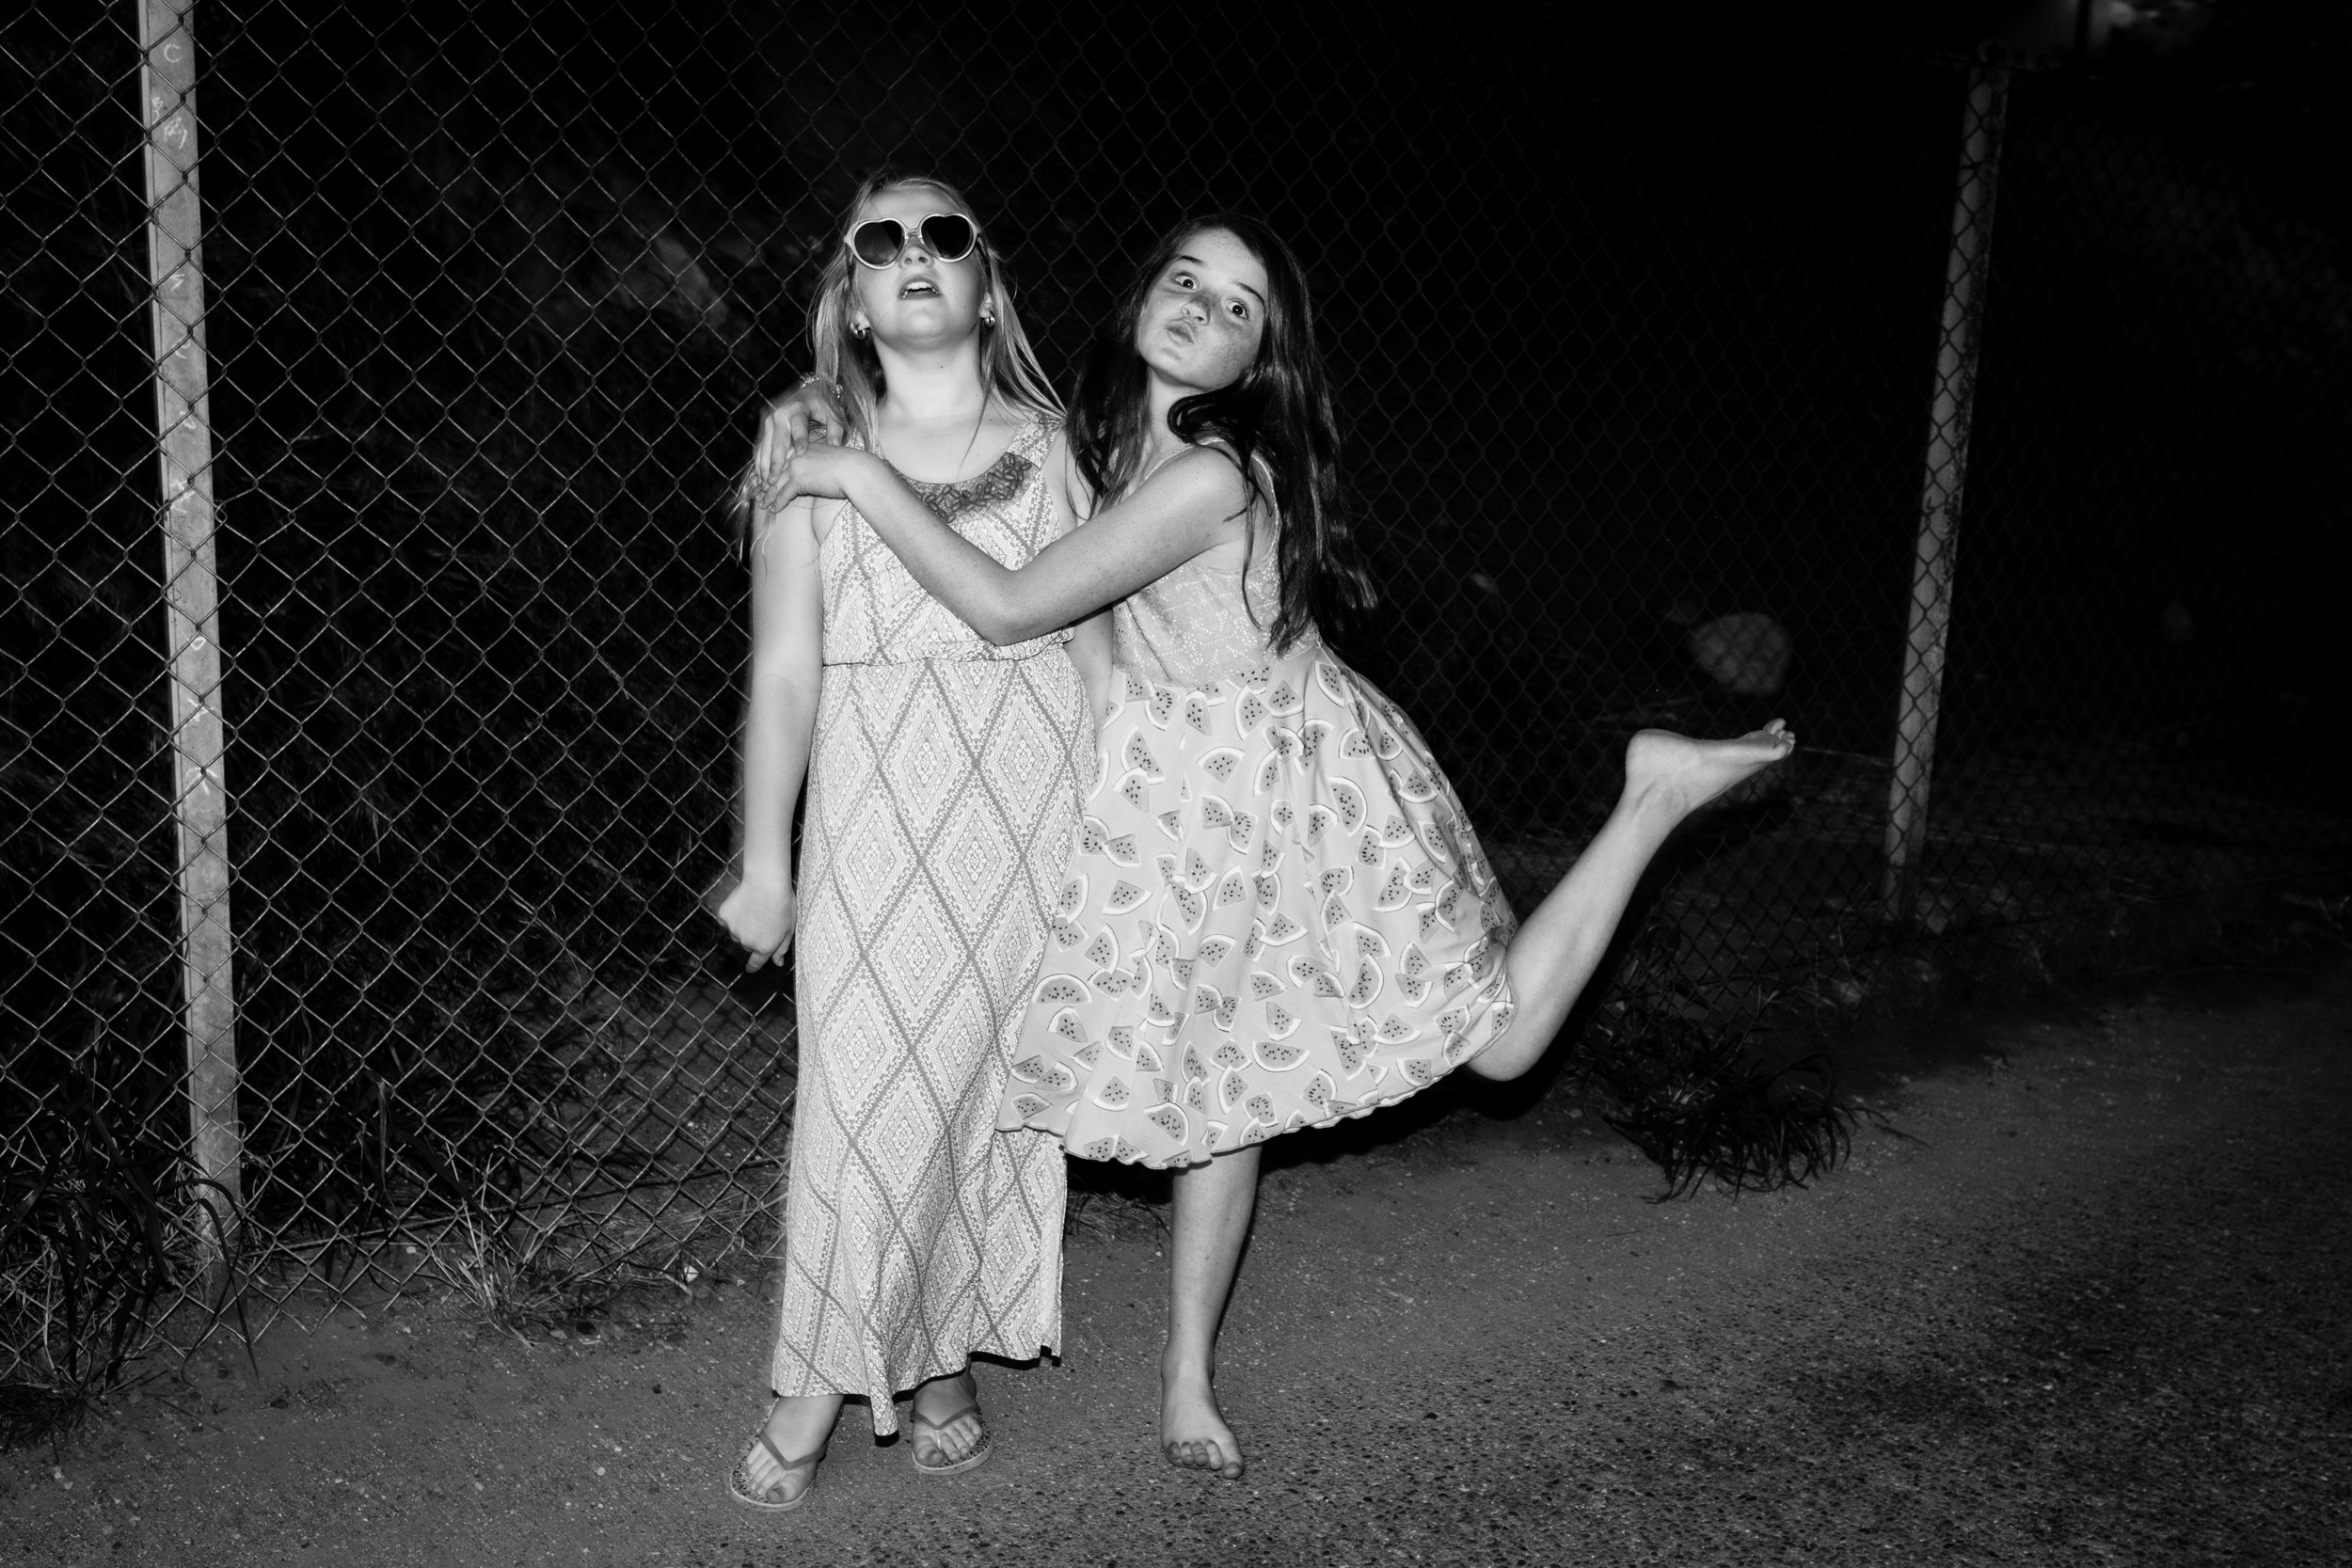 thegirls-102.jpg